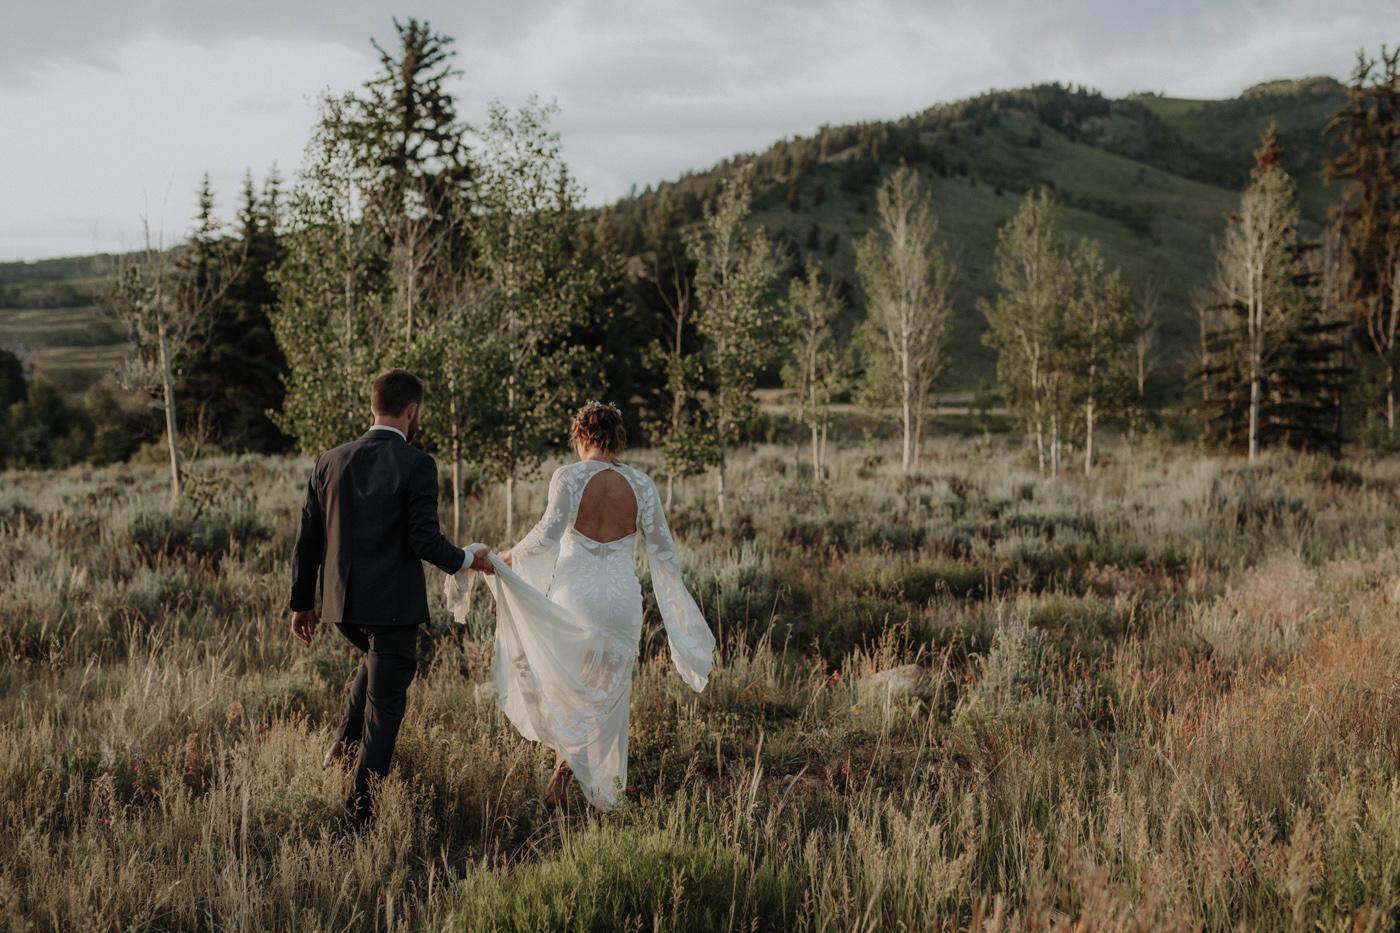 woods-walk-trail-crested-butte-colorado-wedding-126.jpg